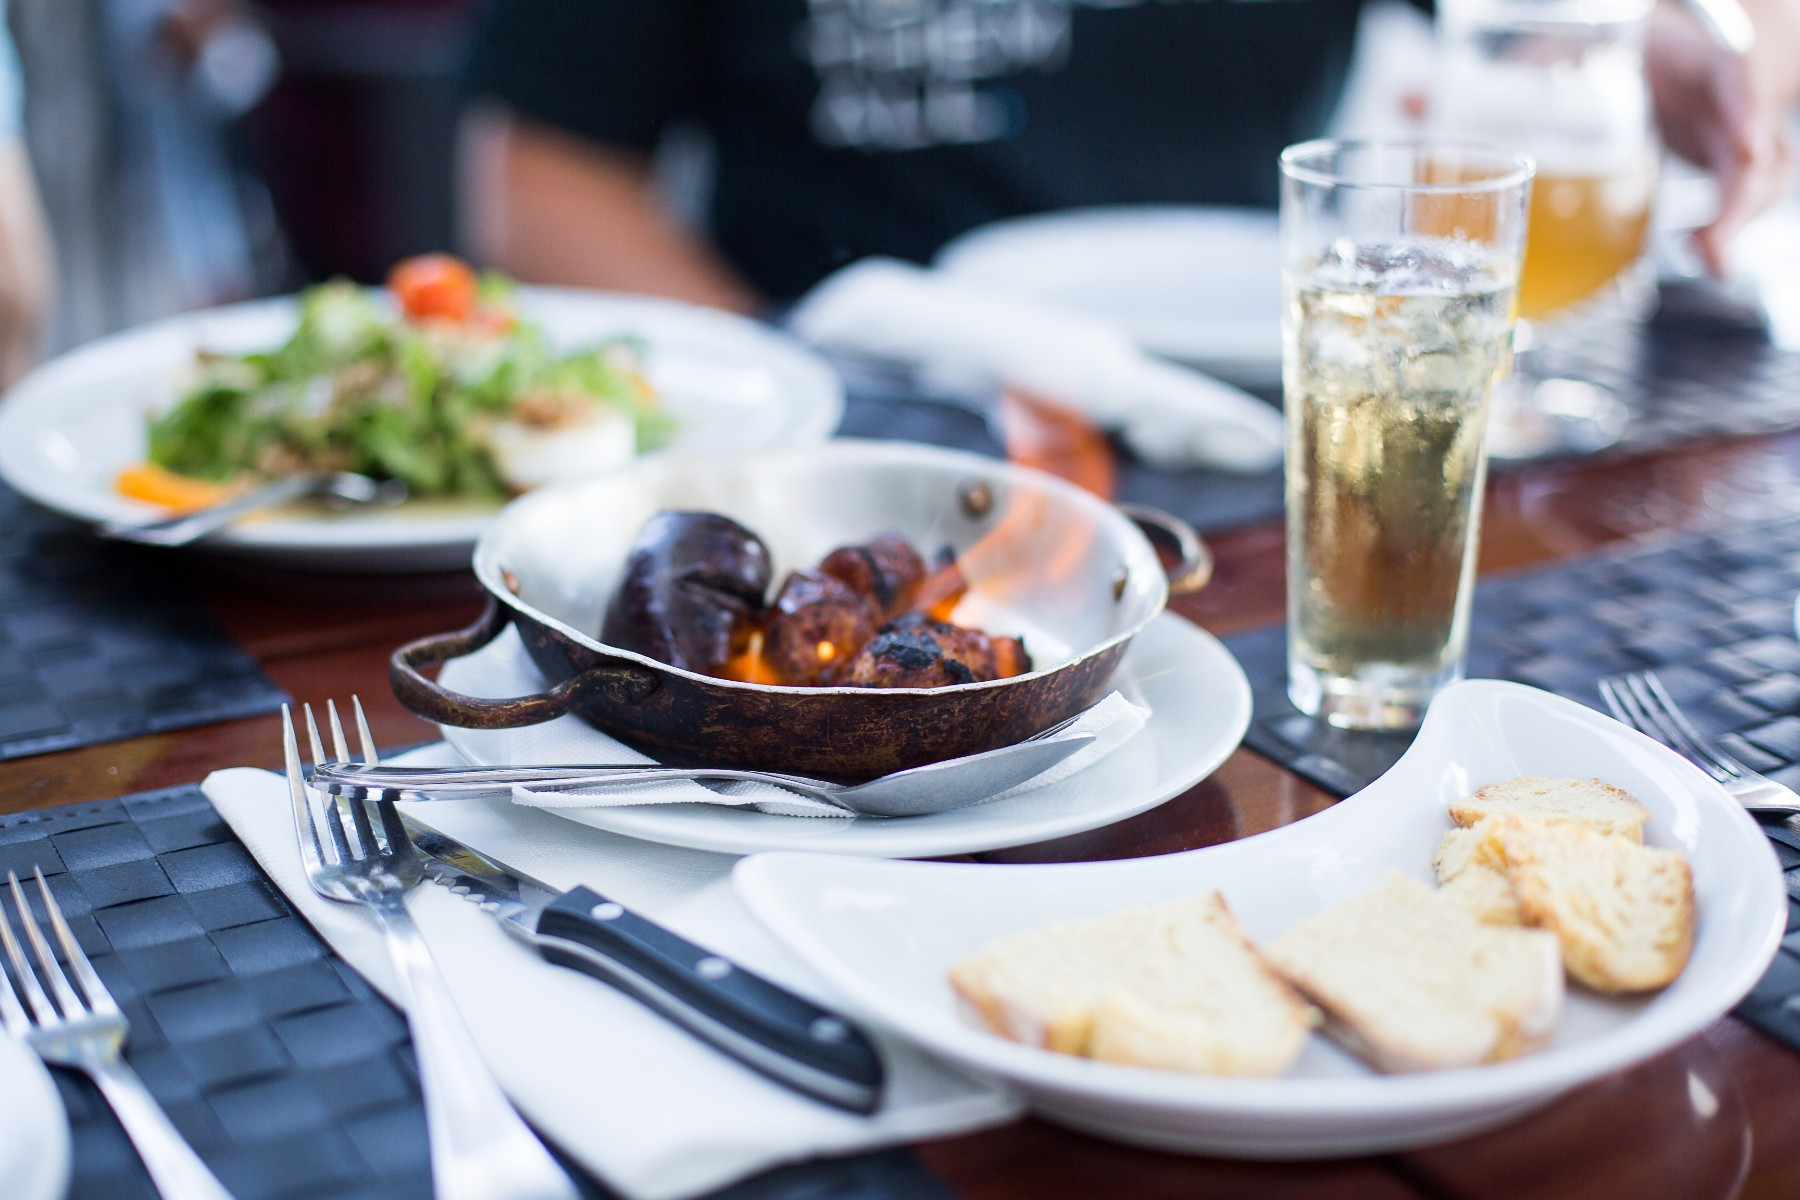 Portuguese cuisine, dinner table in Portugal